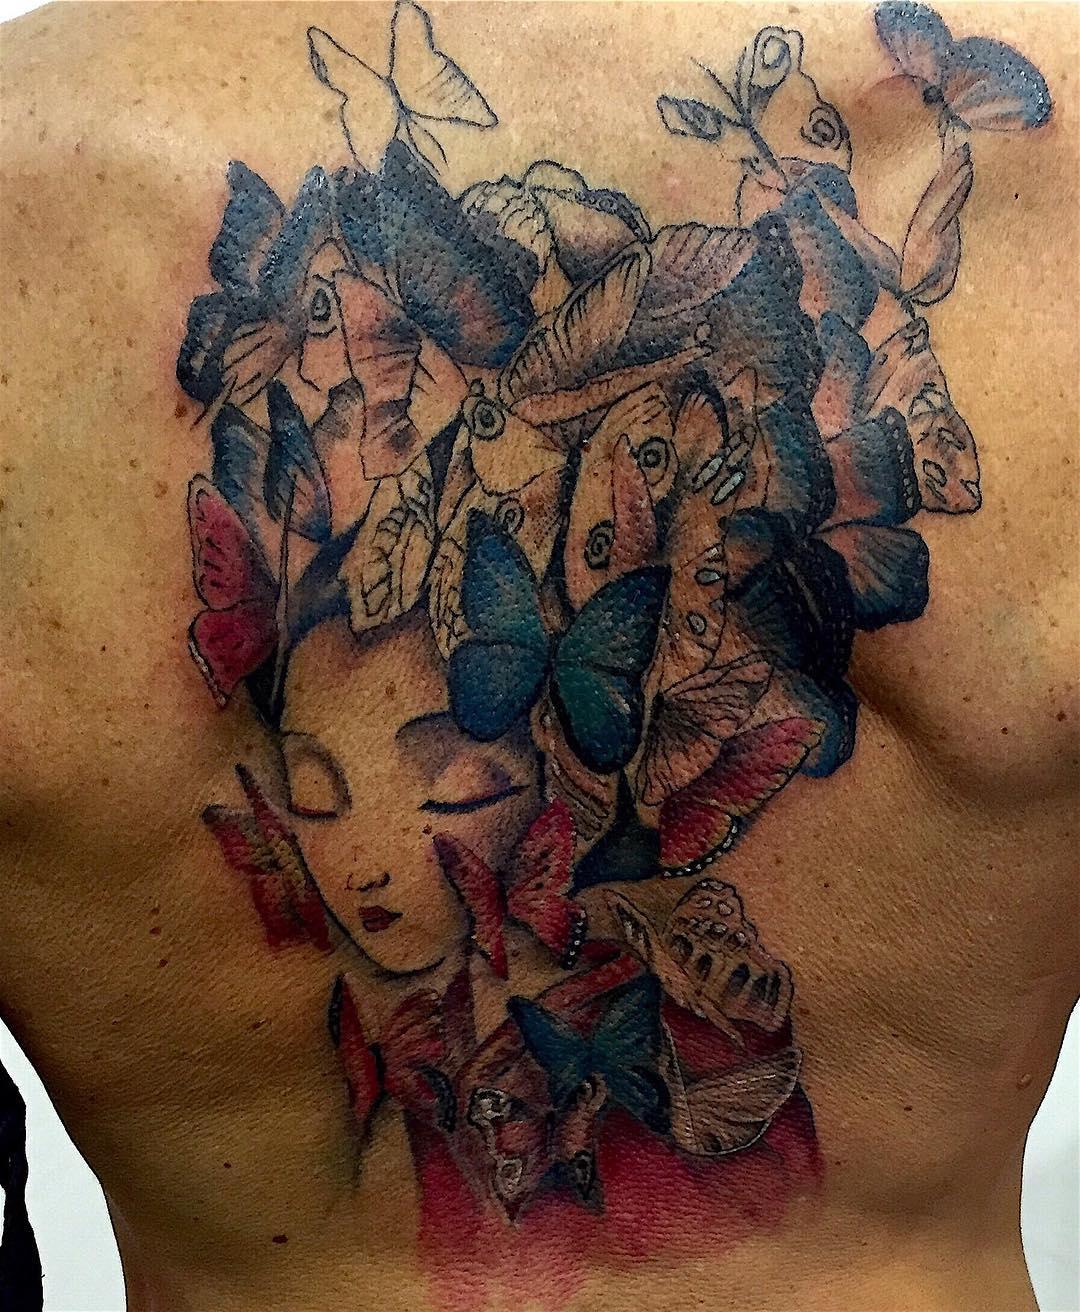 confianza,f4f,followforfollow,followme,tagsforlike,oldlines,follow,juantabasco,skinartmag,thebesttattooartist,oldschooltattoo,tatuajesciudadreal,tatuajesenciudadreal,supportgoodtattooing,tattoocommunity,inklife,inkedlife,igersciudadreal,realismo,thuglife